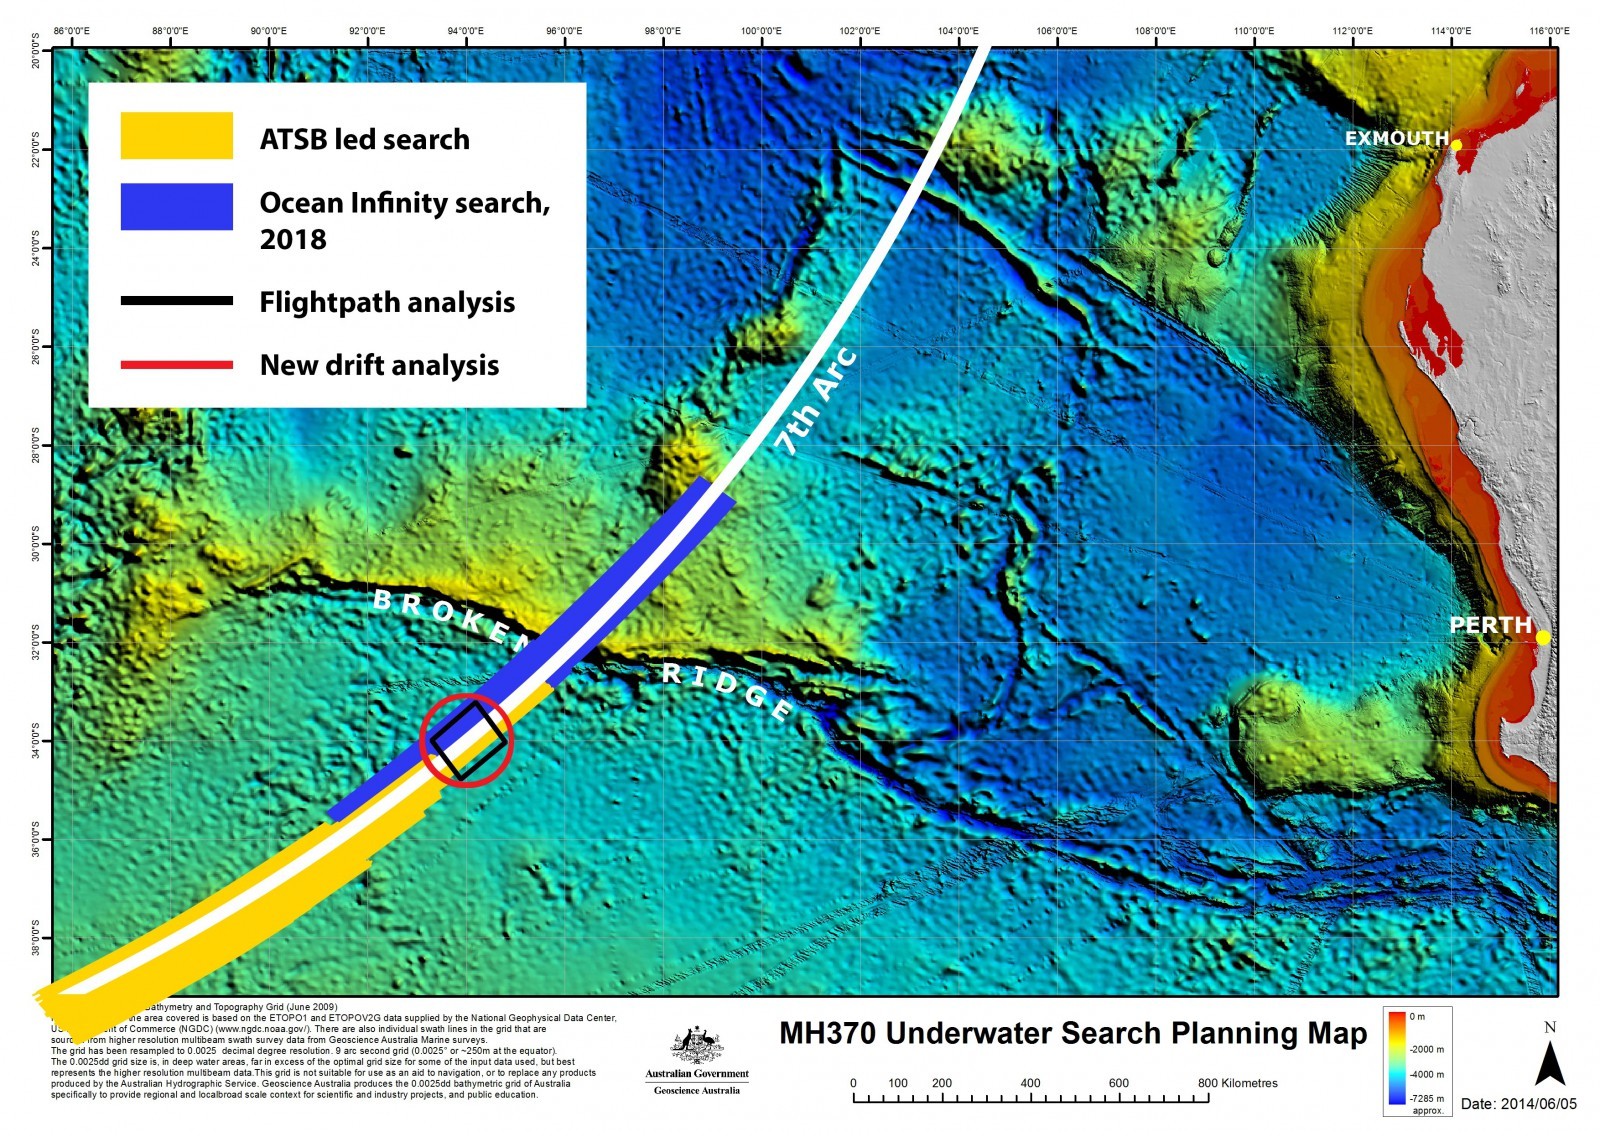 Peta Pencarian MH370 di Bawah Laut